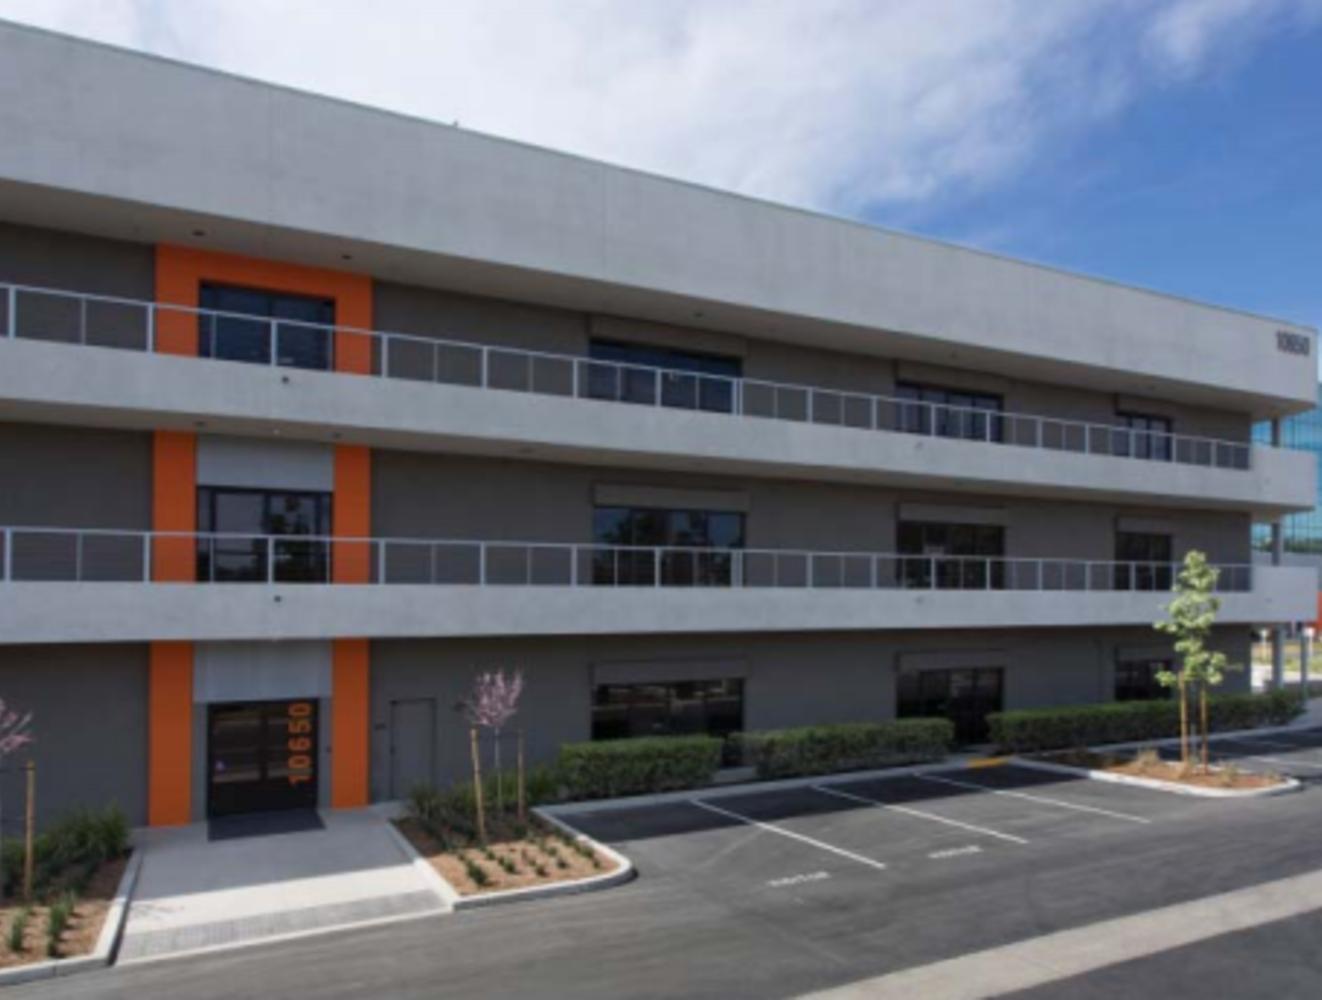 Office San diego, 92131 - 10650 Treena St